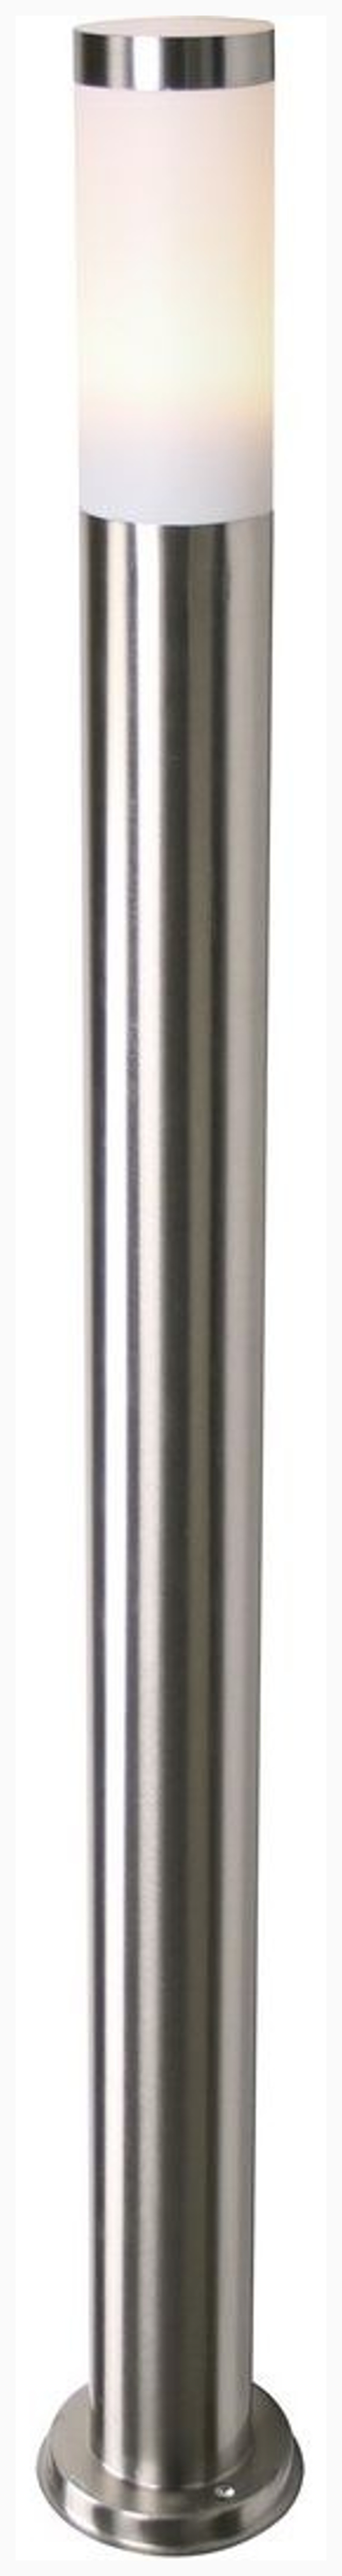 Ландшафтный столбик Arte Lamp A3157PA 1SS